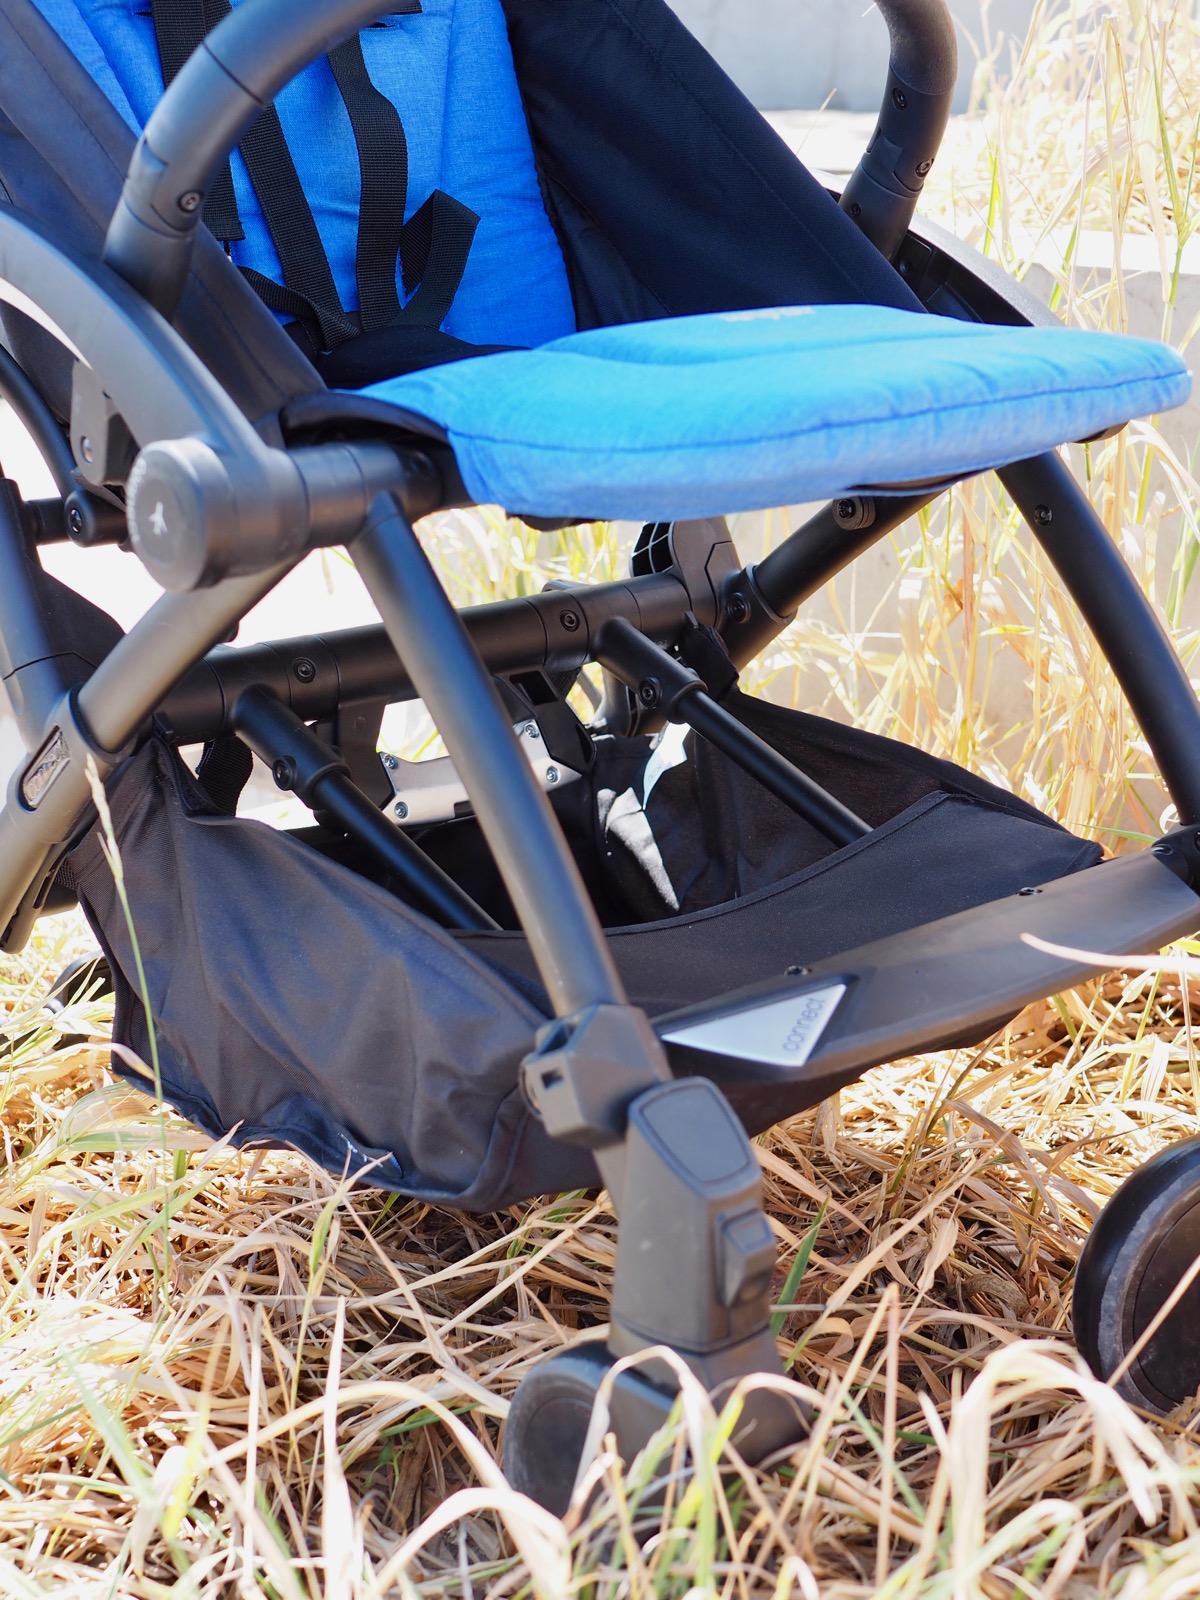 Bumprider Connect wózek do samolotu spacerówka gondola recenzja